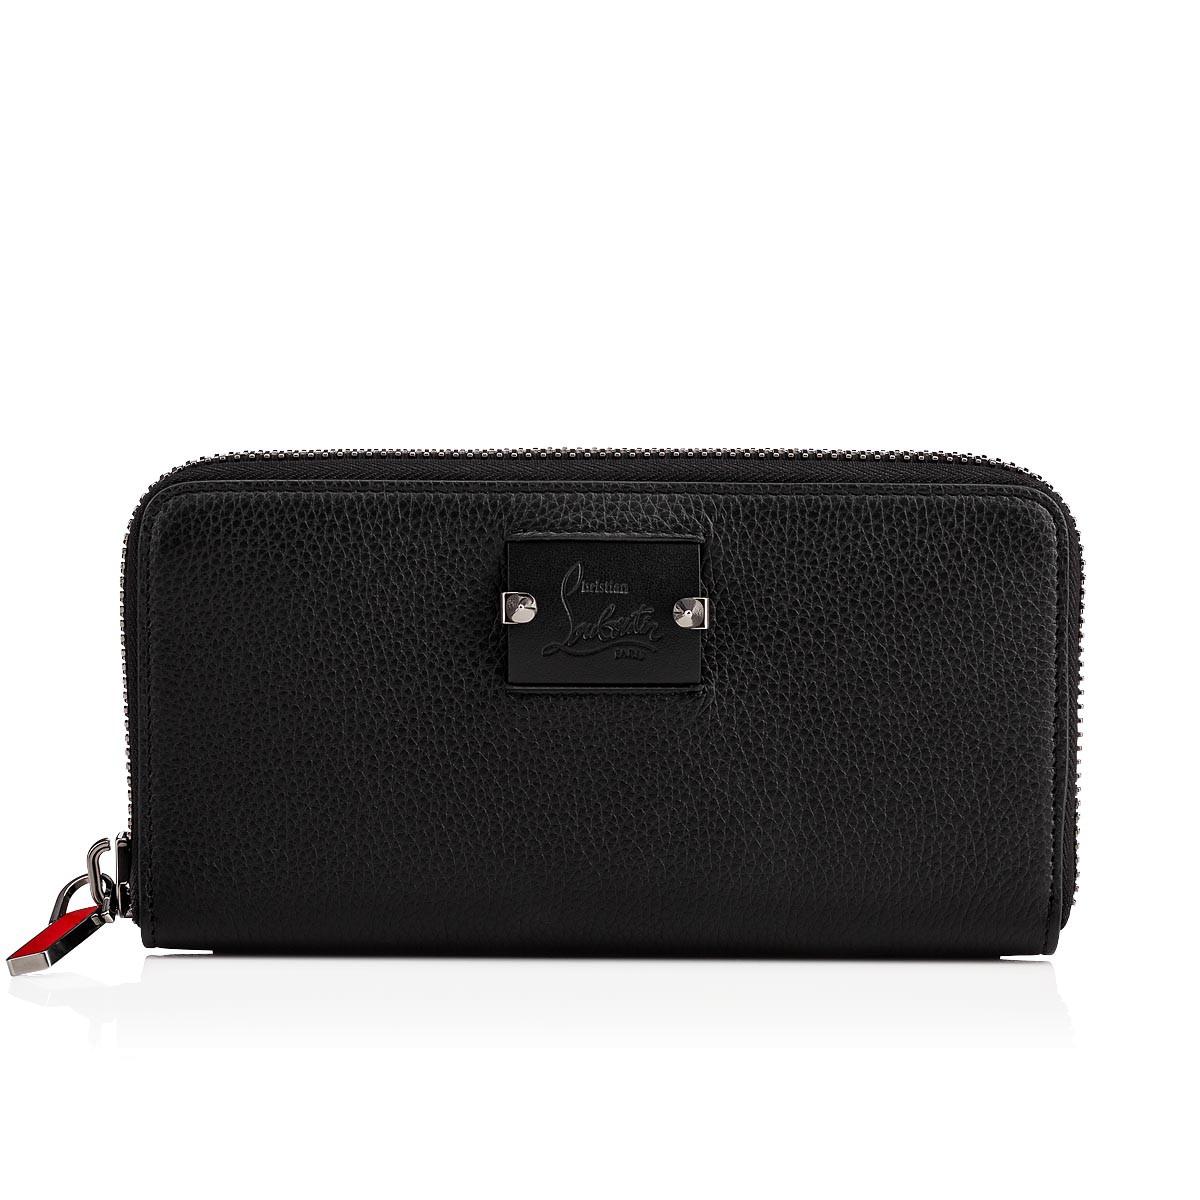 1e3c4f8eeb3 Panettone Wallet Black Calfskin - Accessories - Christian Louboutin